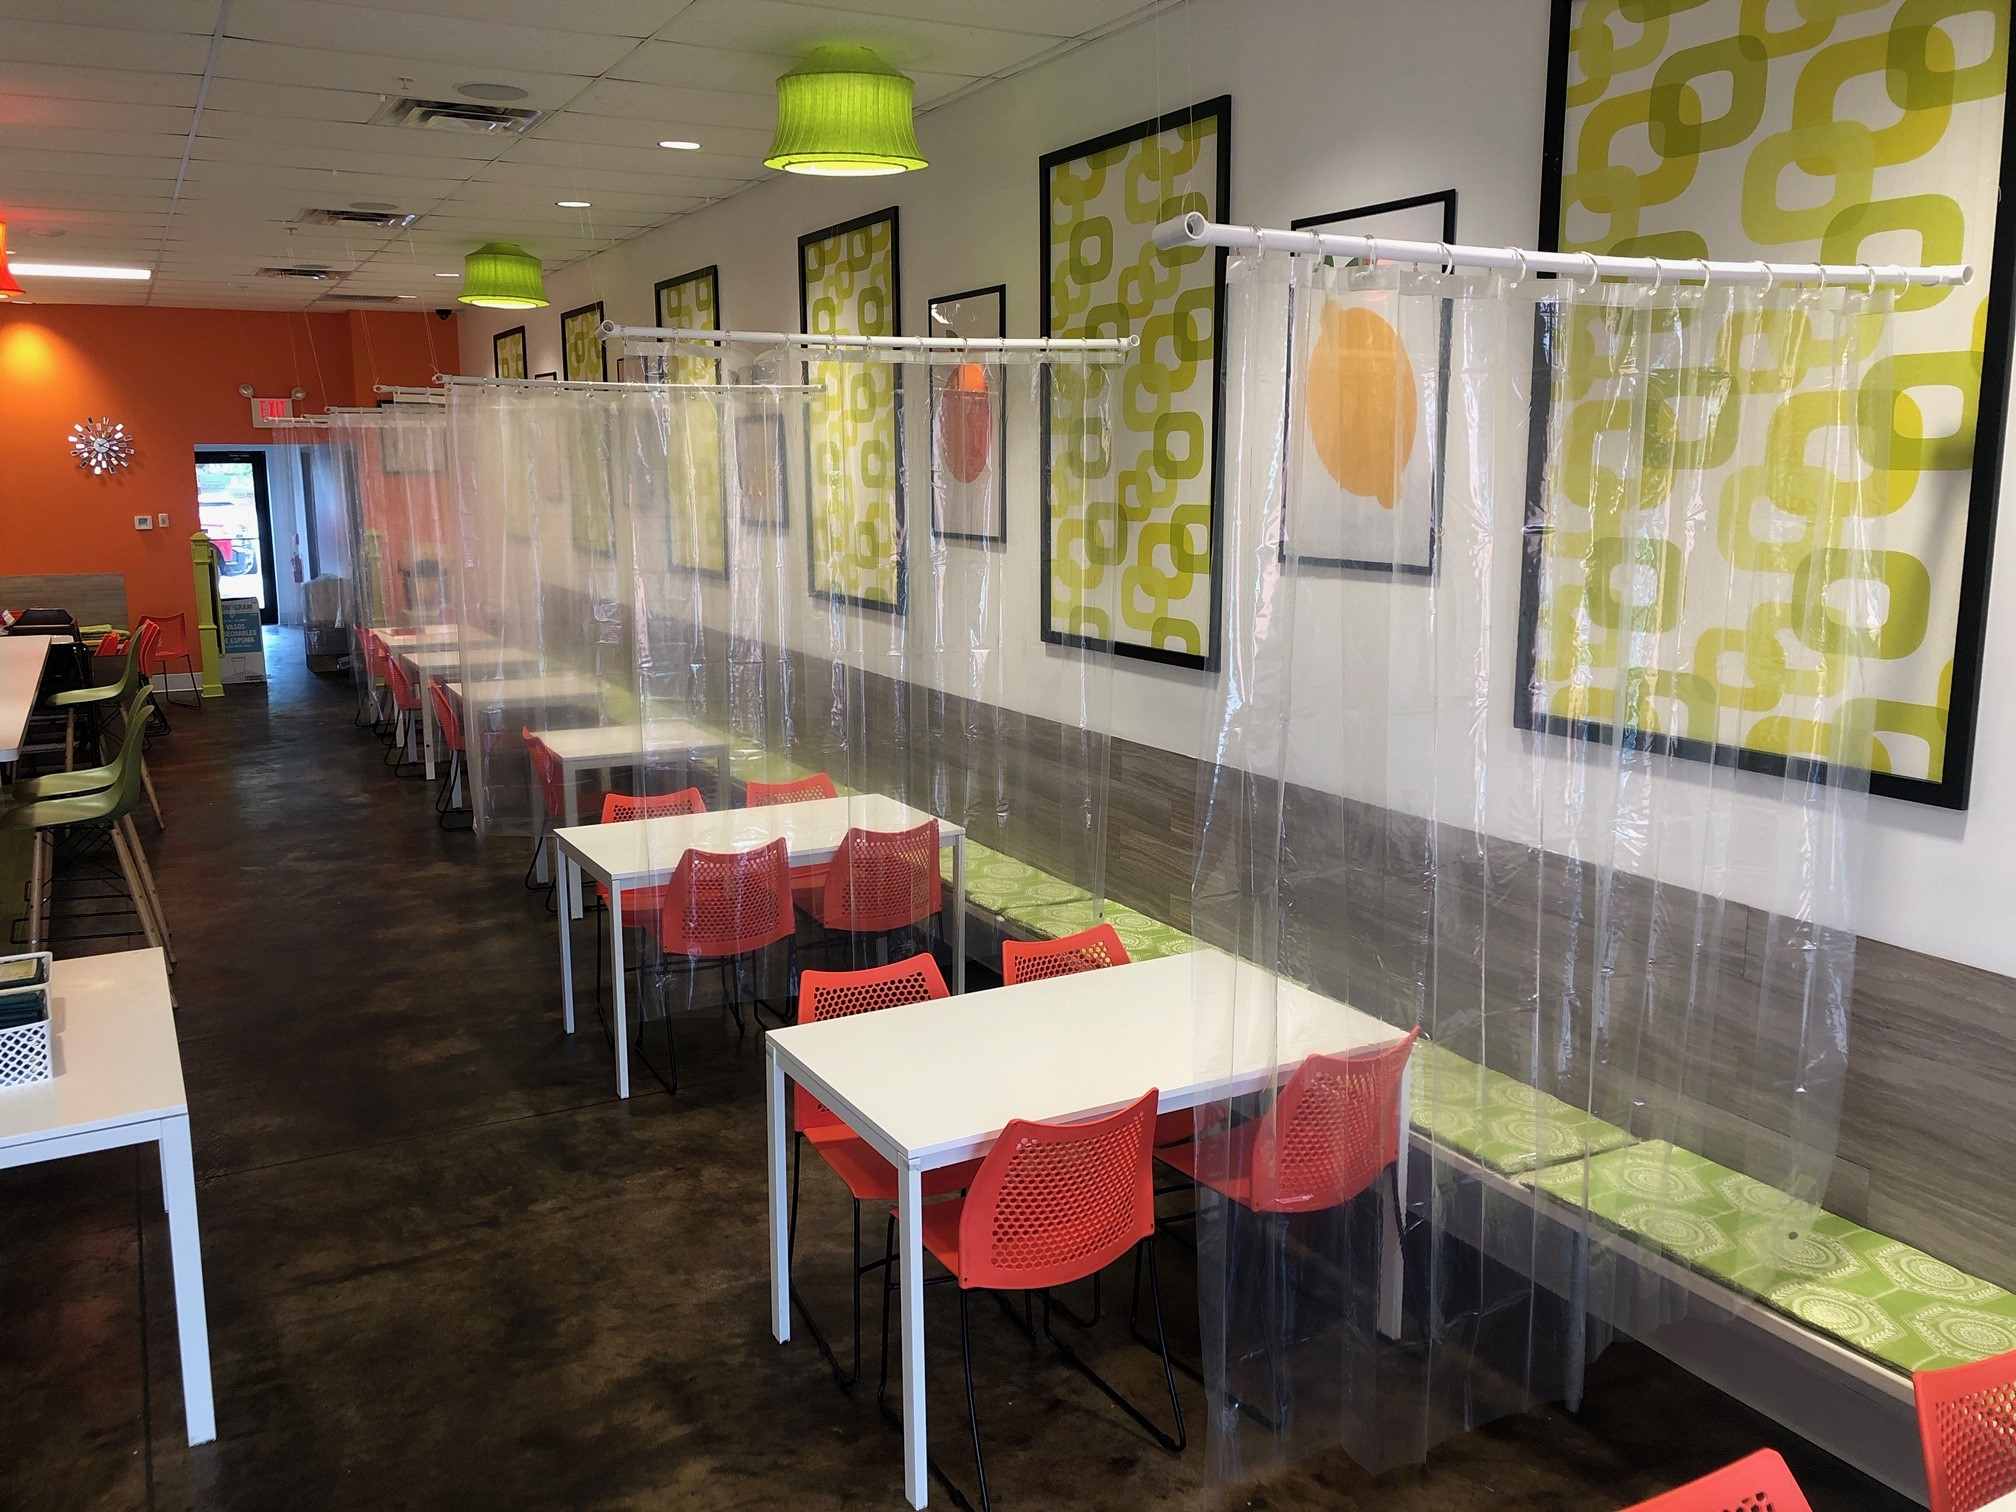 ohio restaurant adds shower curtain